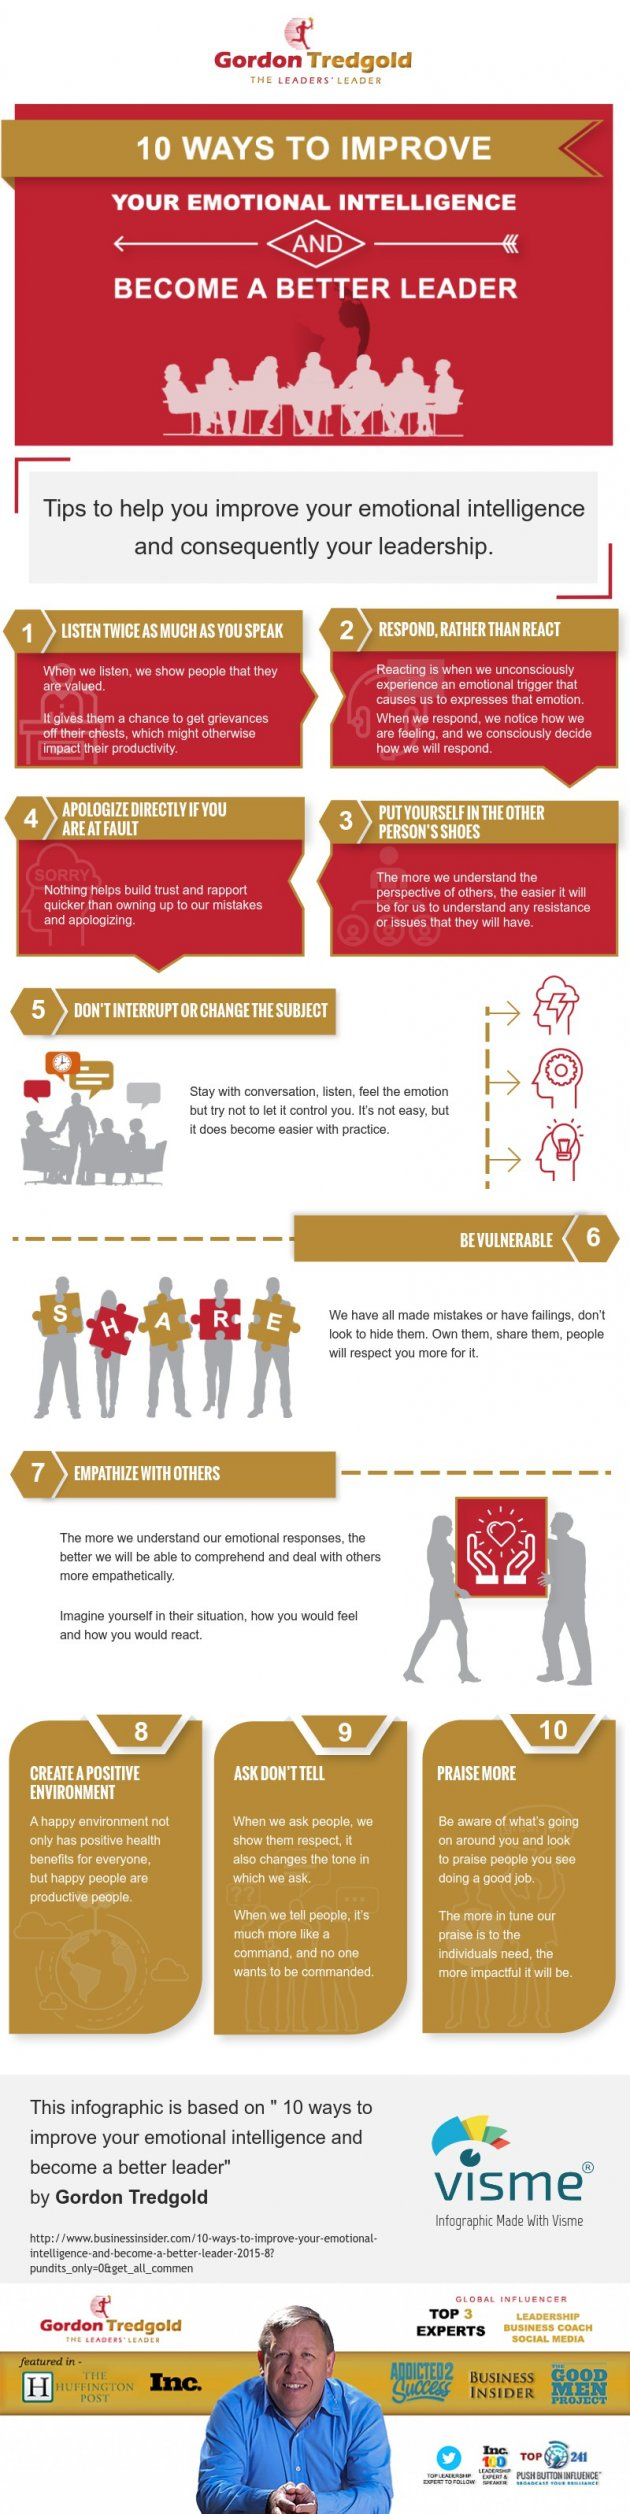 easy-ways-improve-emotional-intelligence-sales.jpg